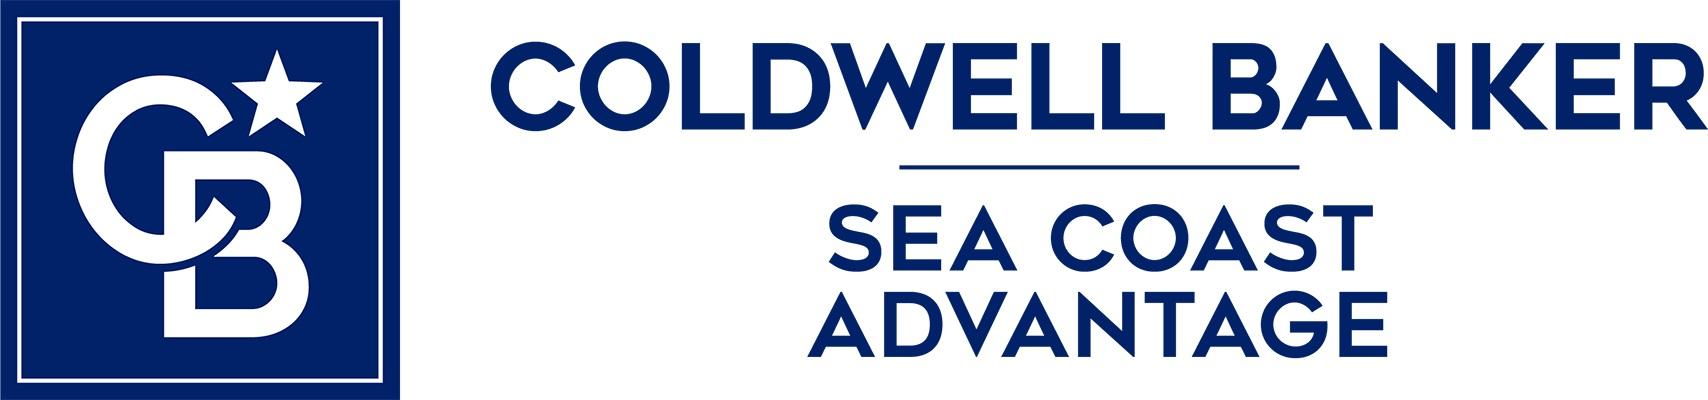 Julie Chappell - Coldwell Banker Sea Coast Advantage Realty Logo